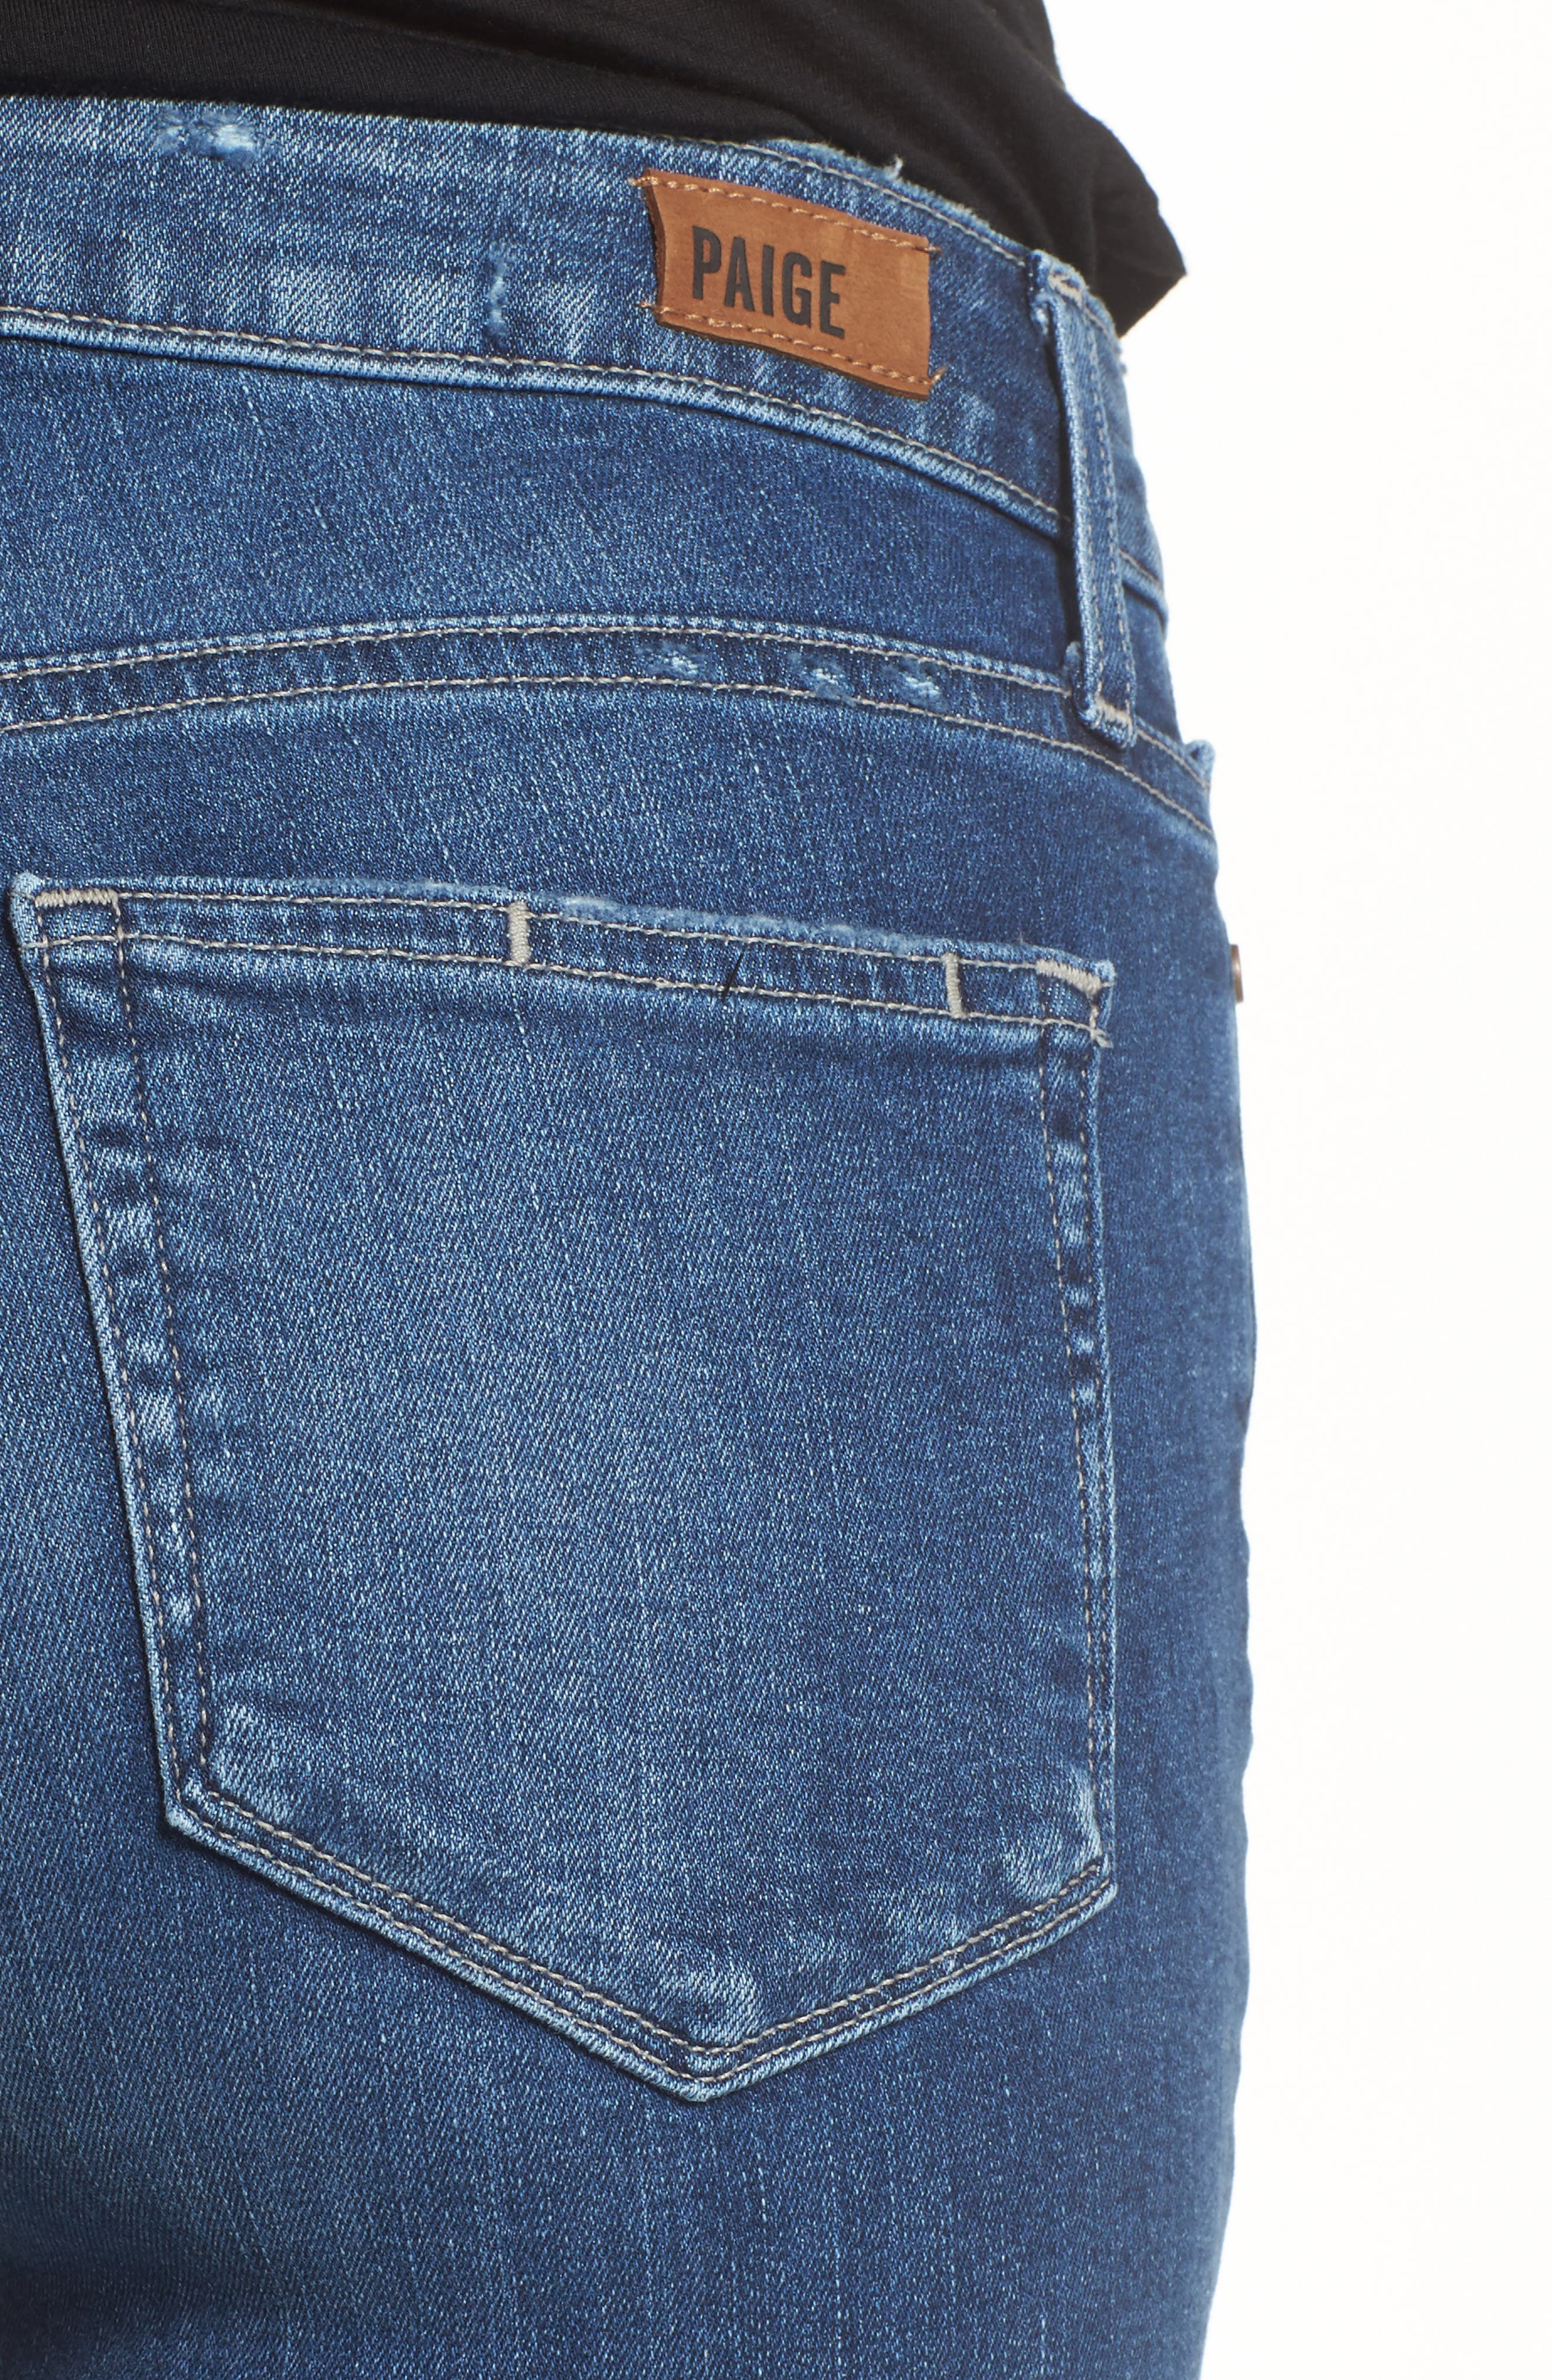 Transcend - Hoxton Ankle Straight Leg Jeans,                             Alternate thumbnail 4, color,                             Malibu